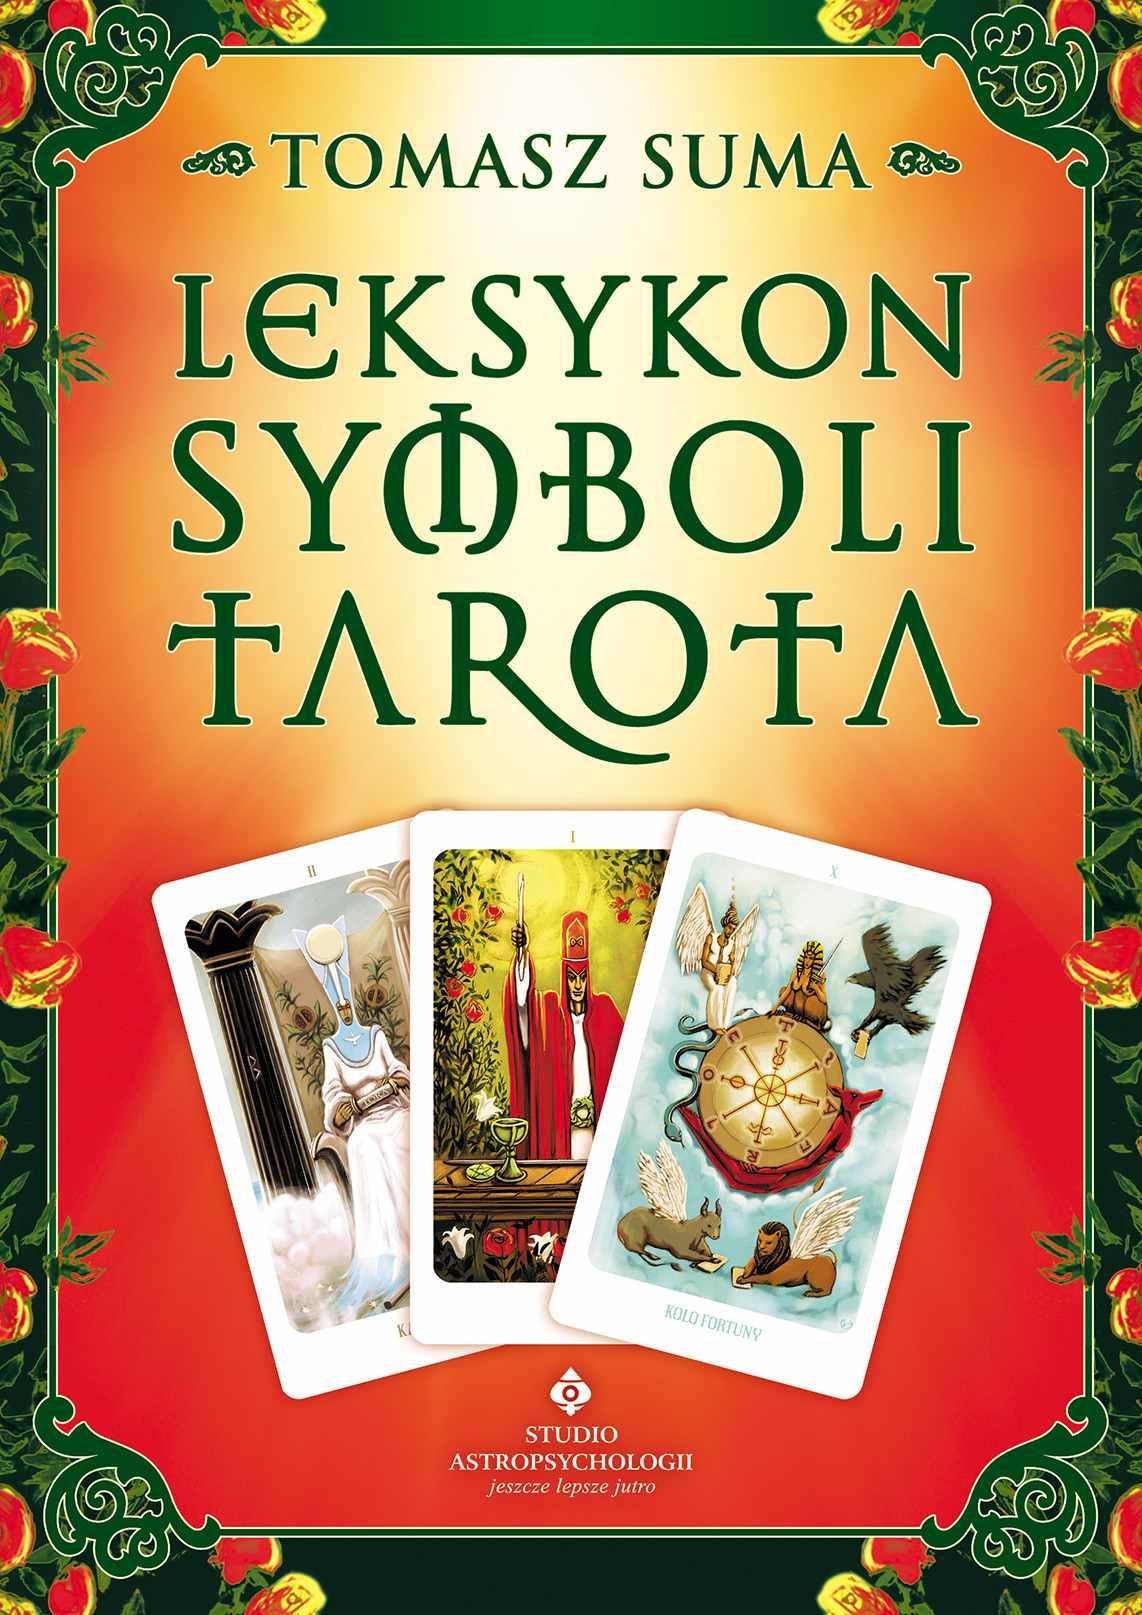 Leksykon symboli Tarota - Ebook (Książka na Kindle) do pobrania w formacie MOBI